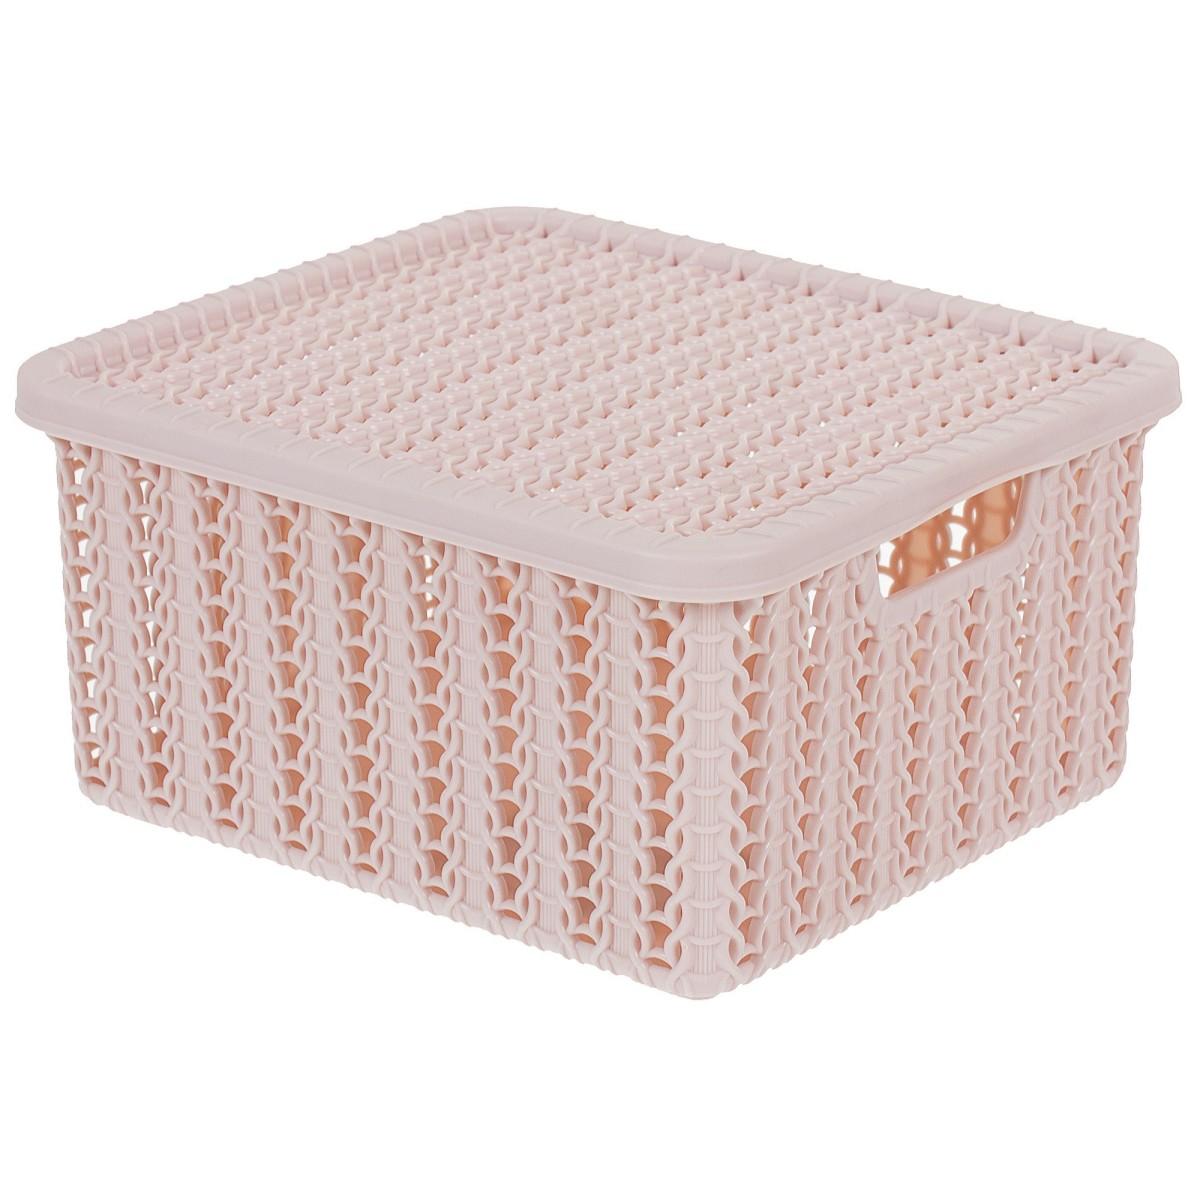 Коробка Вязание 1.5 л